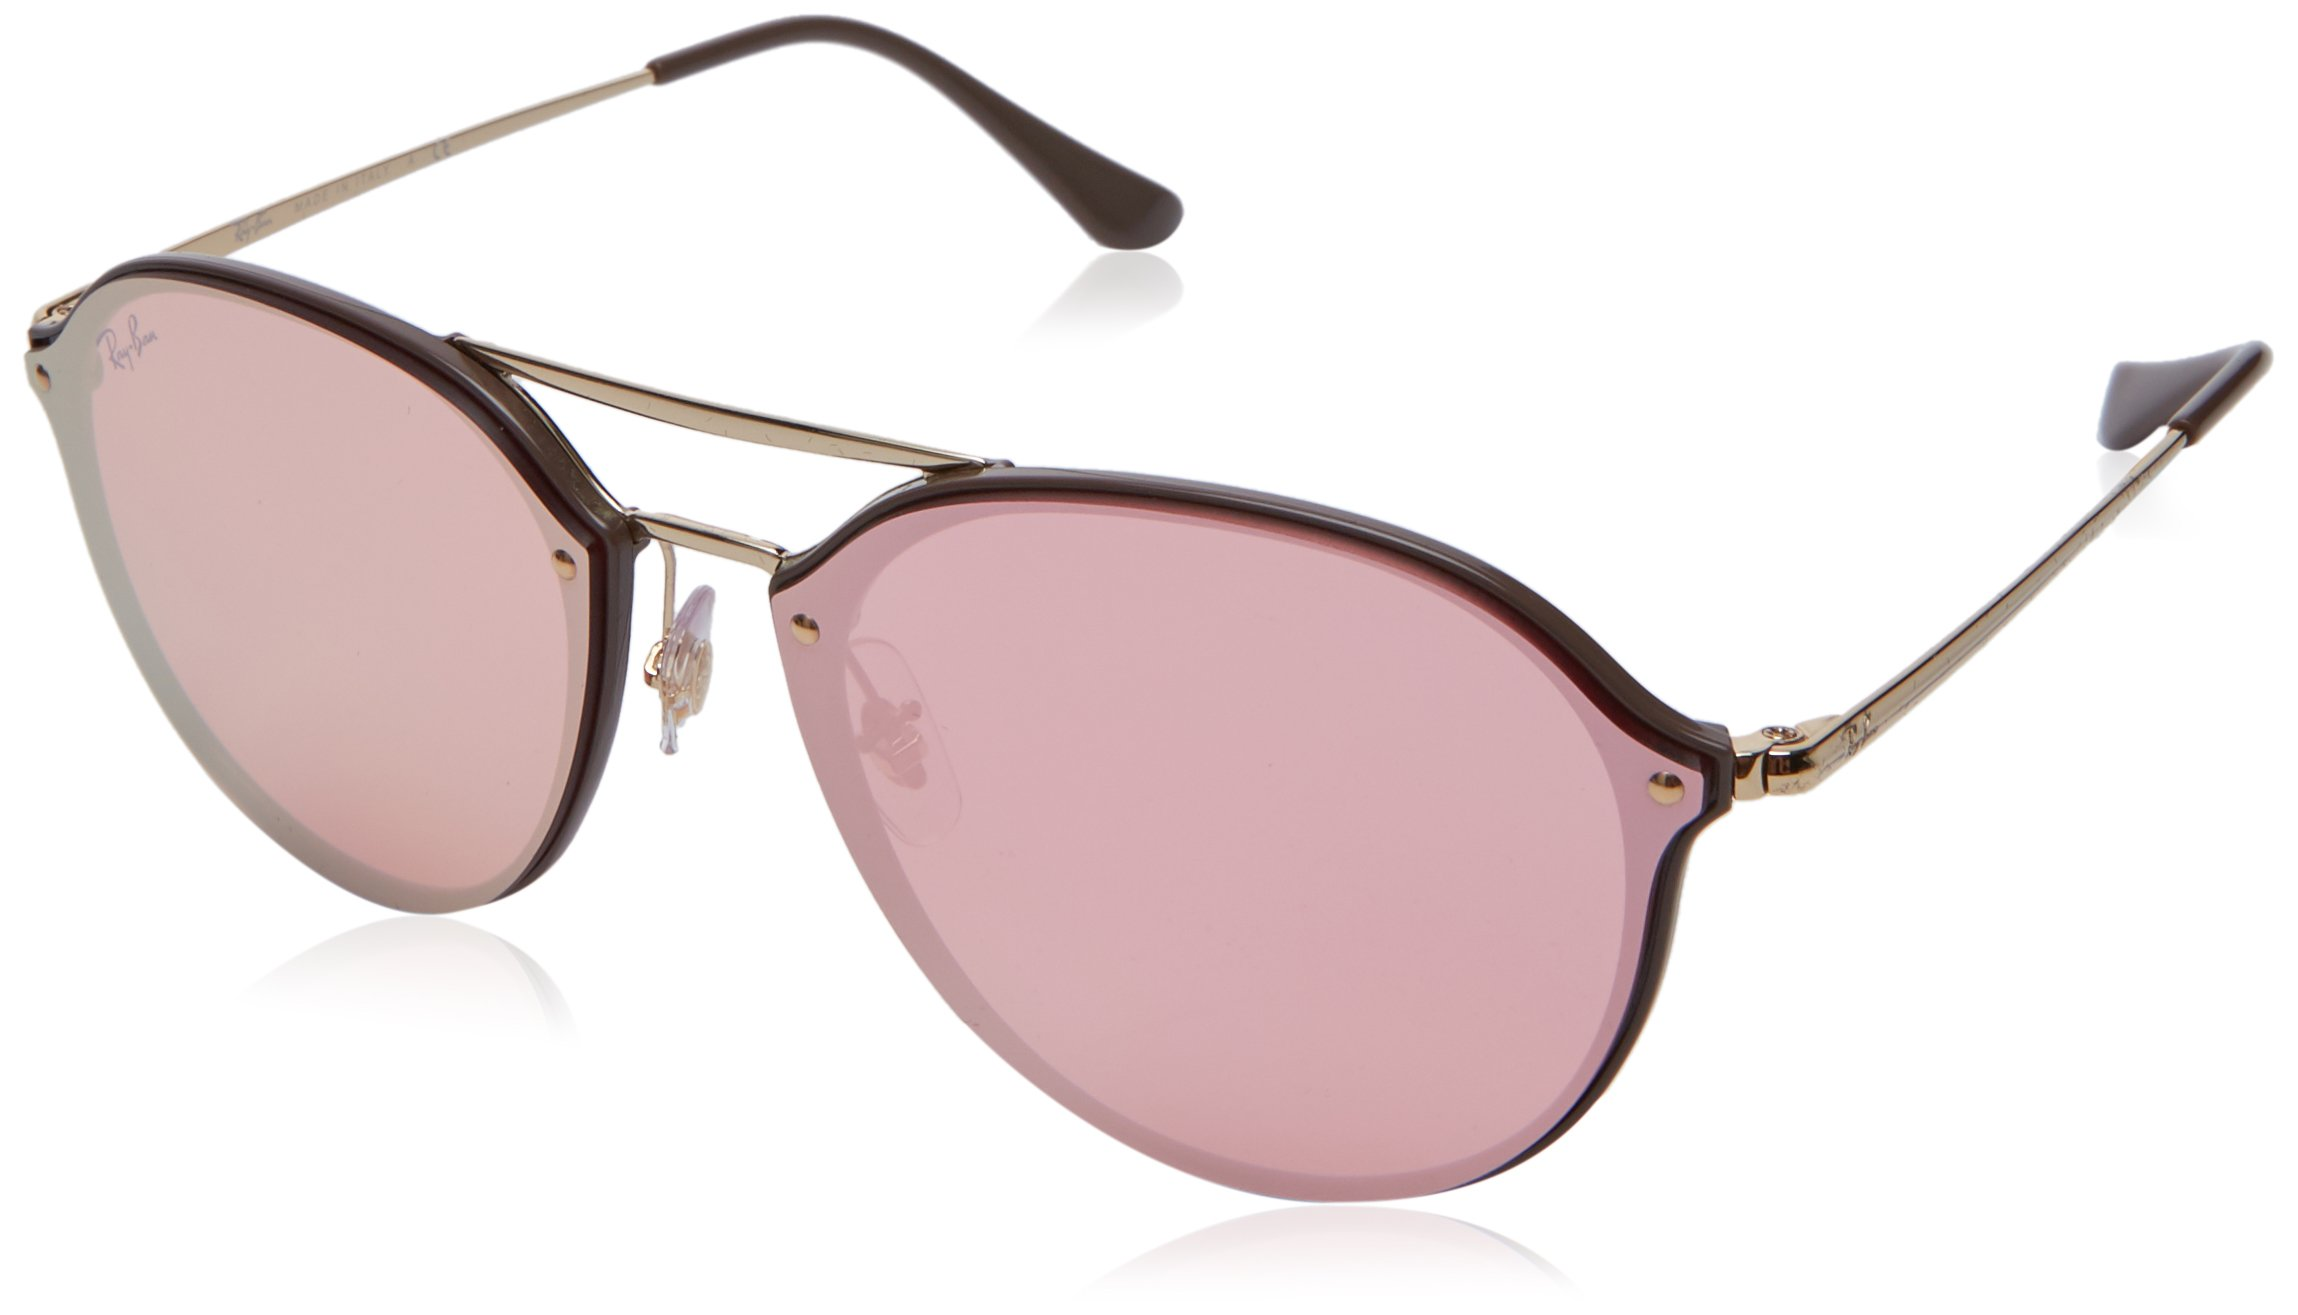 Ray-Ban 0rb4292n6327e462blaze Doublebridge Non-Polarized Iridium Square Sunglasses, Brown, 62 mm